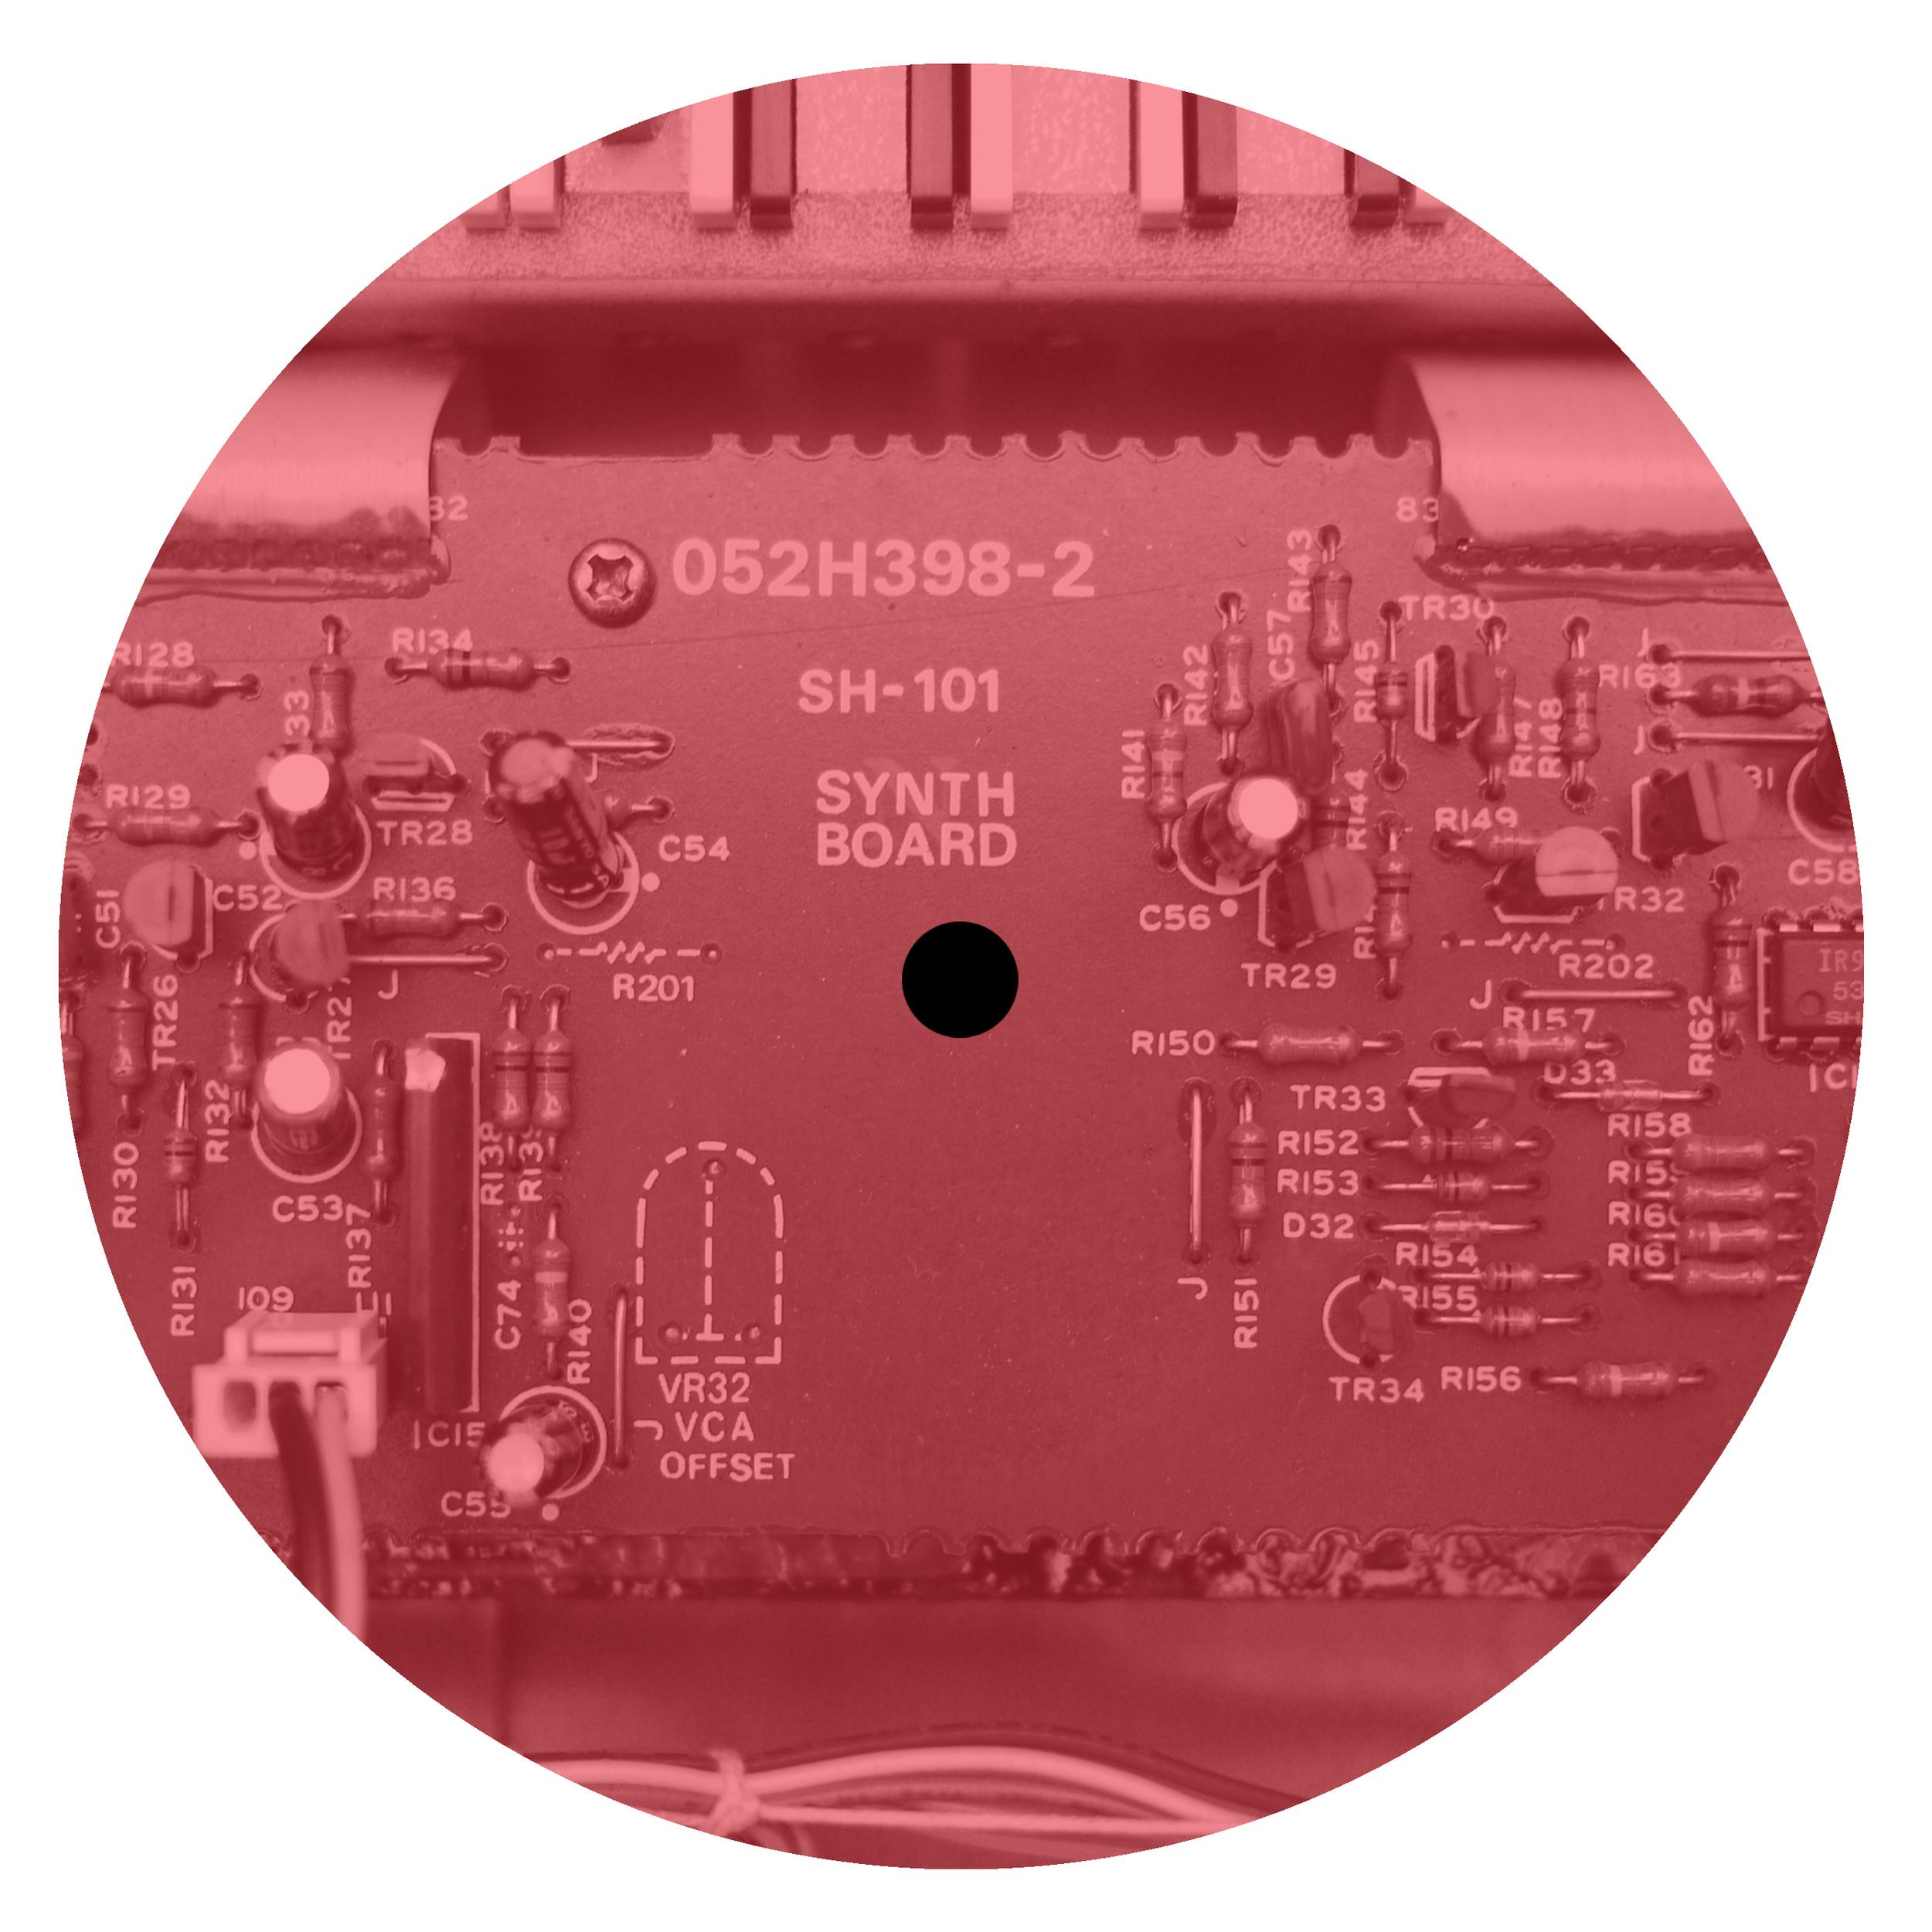 RX-101_EP_2_Label_A.jpg